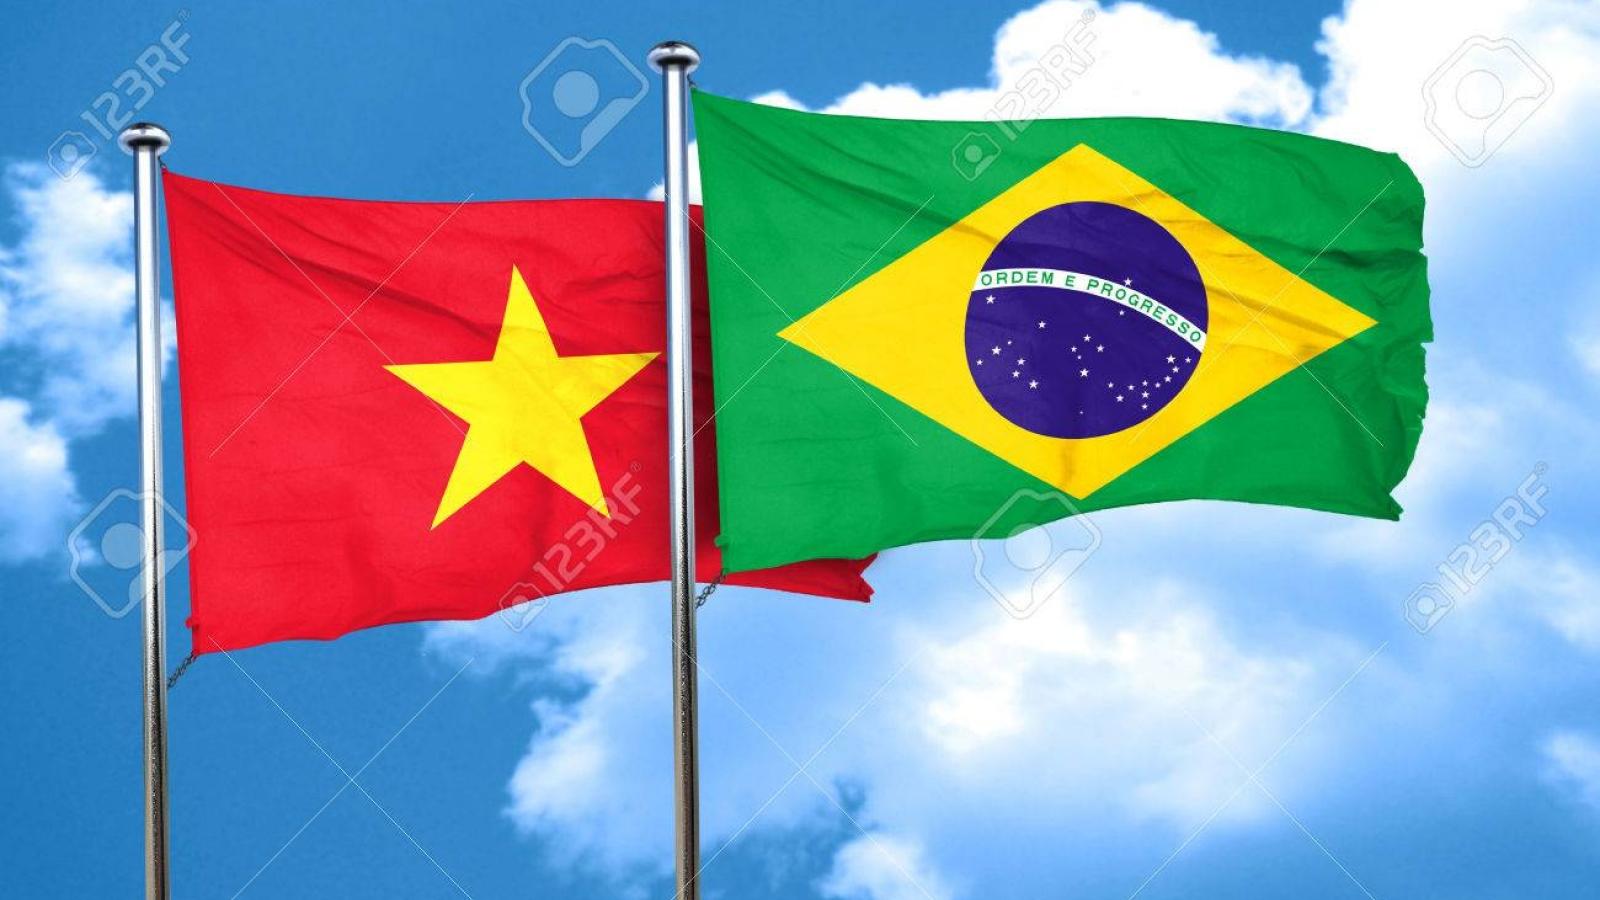 Vietnam becomes leading Brazilian trade partner in ASEAN